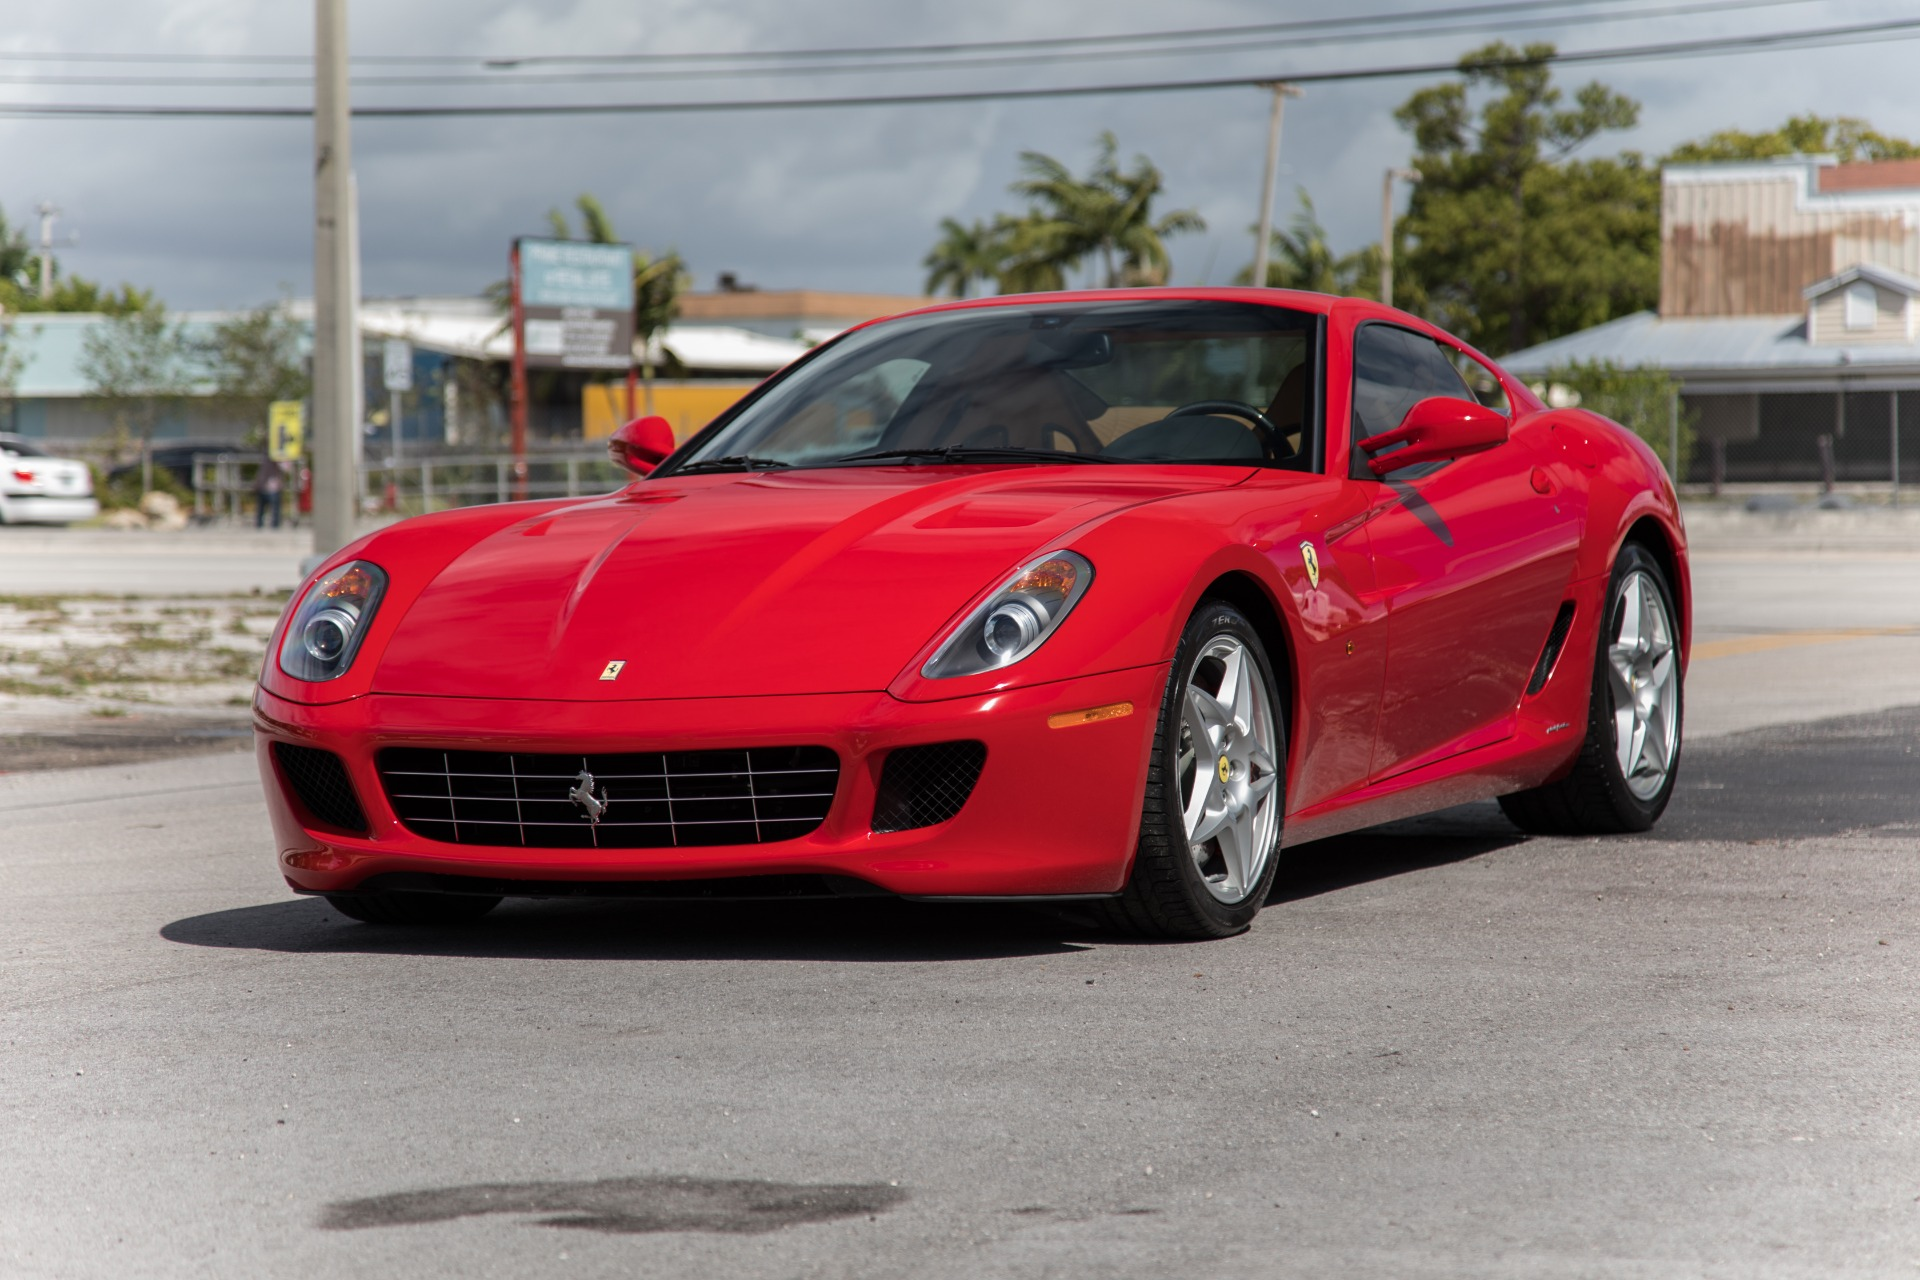 Used 2007 Ferrari 599 Gtb Fiorano F1 For Sale 139 900 Marino Performance Motors Stock 150131